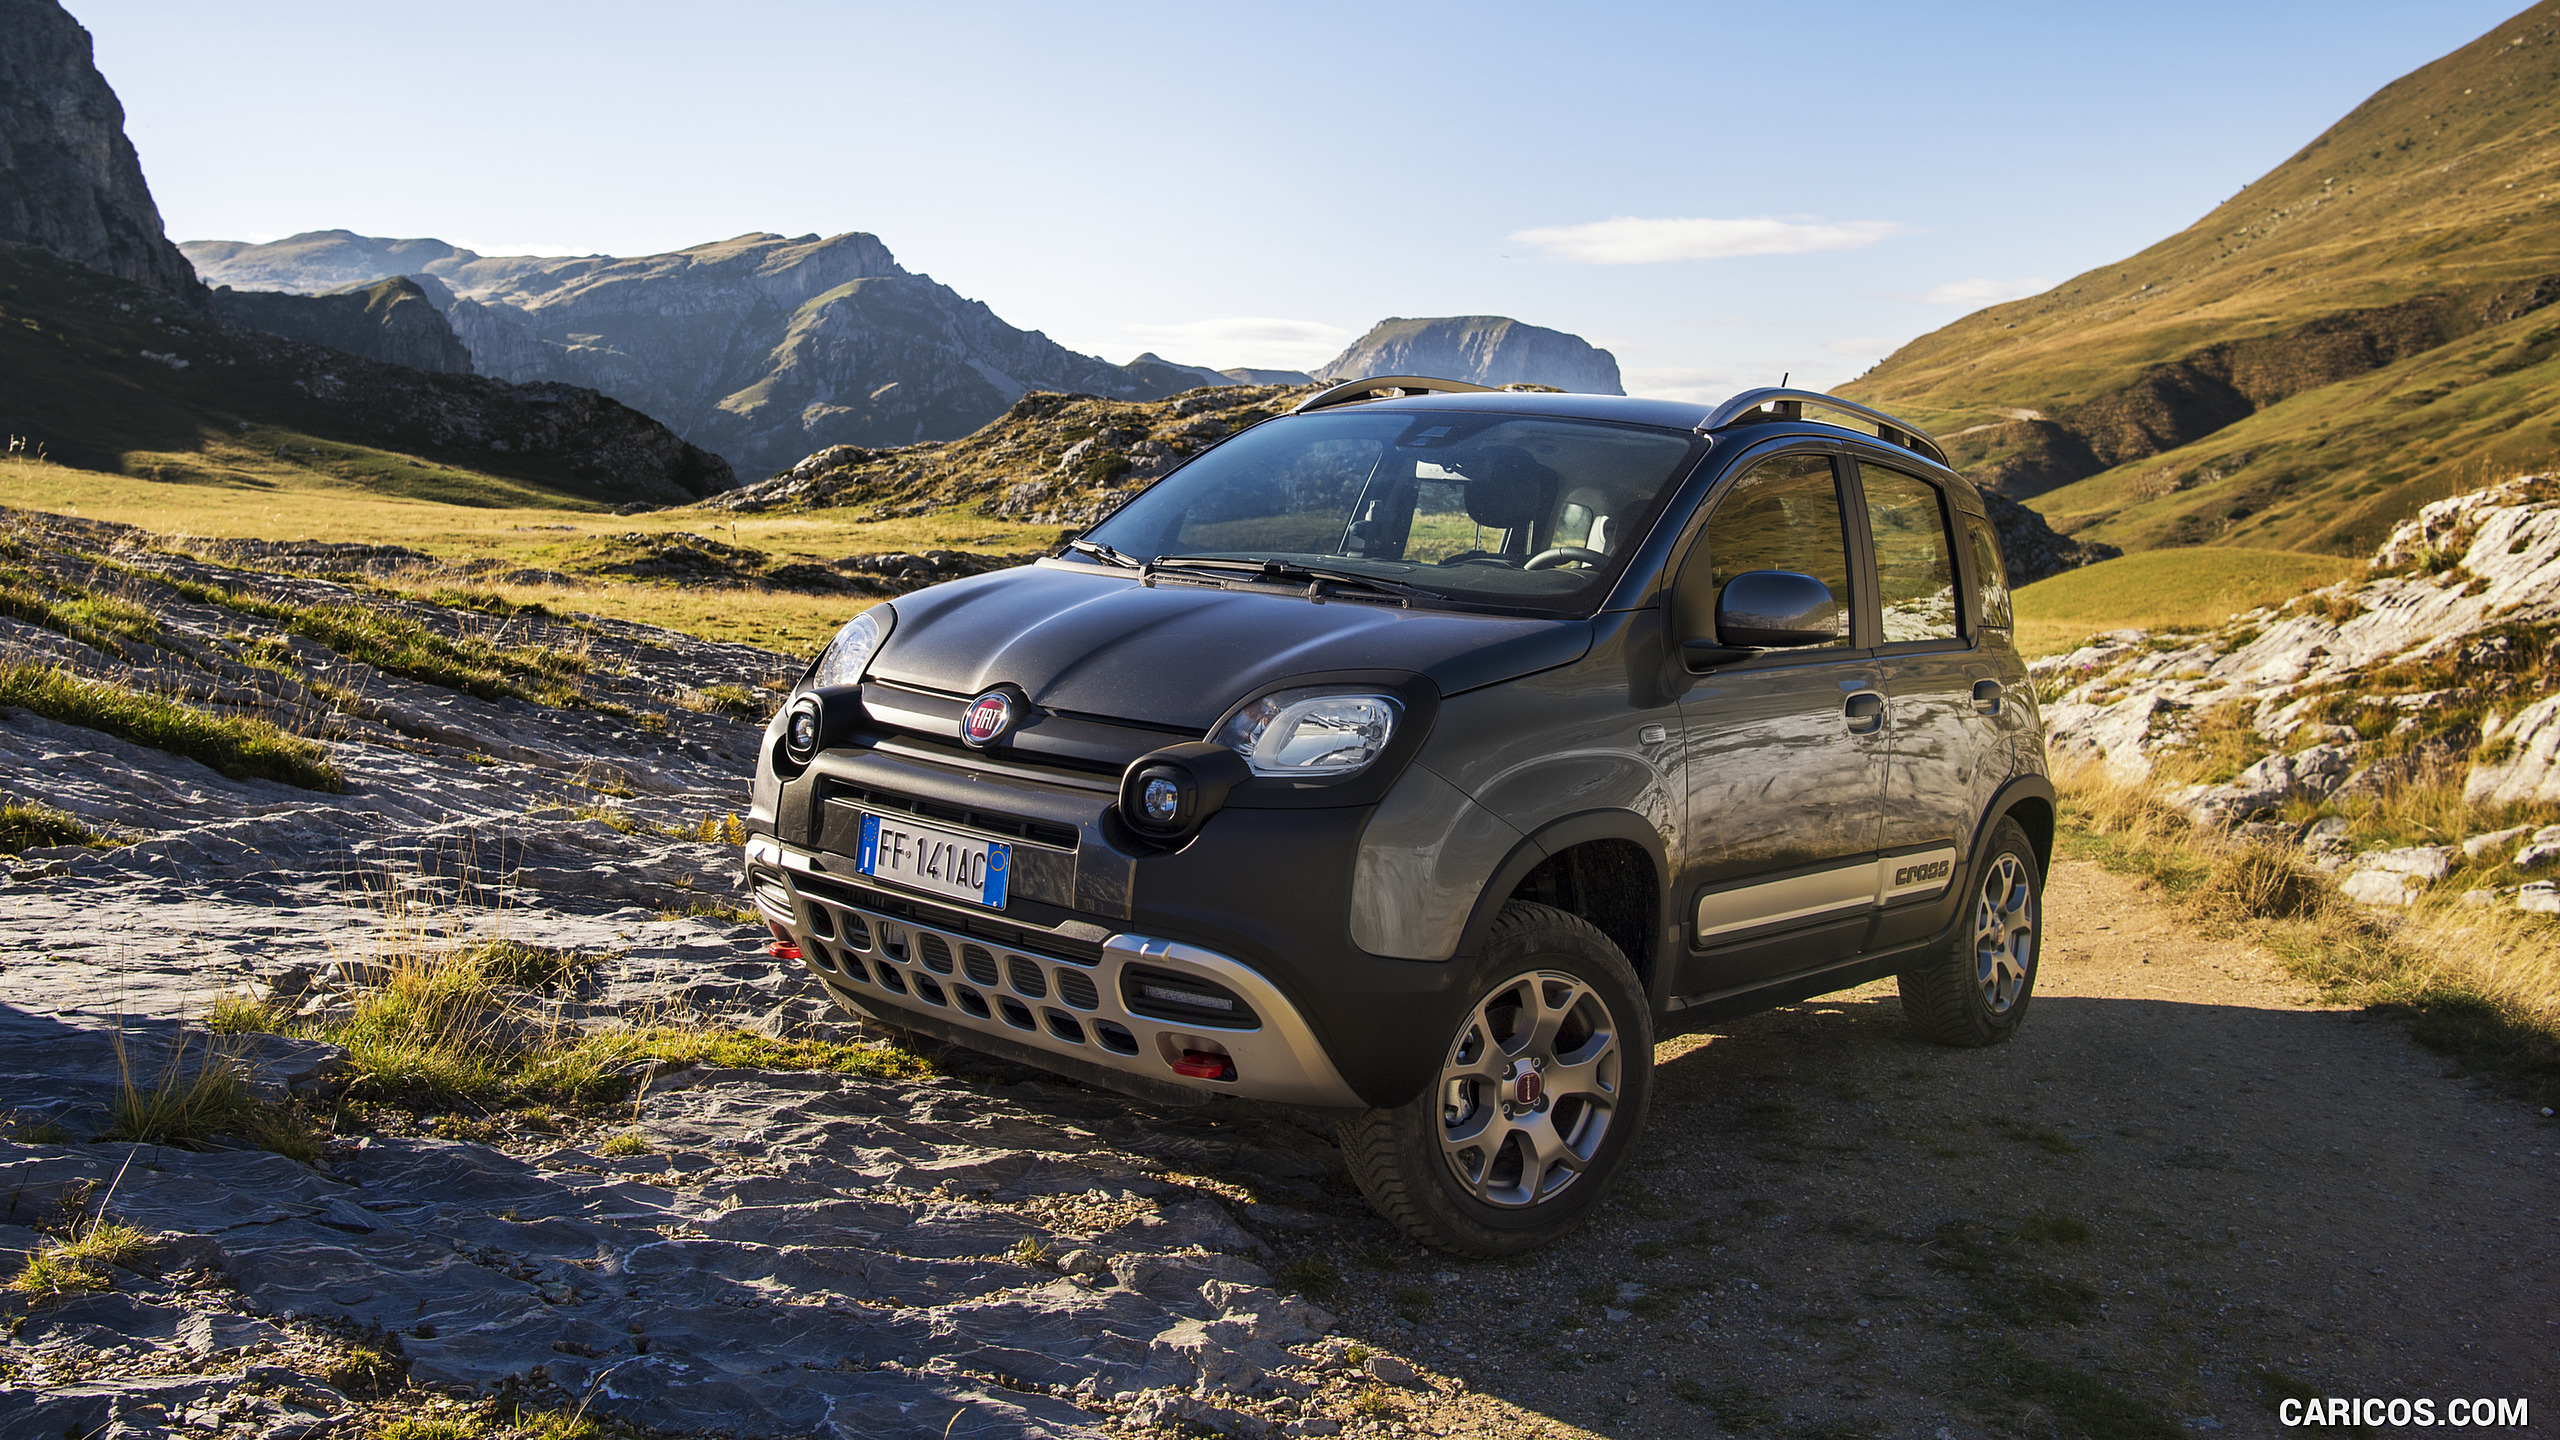 2017 Fiat Panda Cross   Off Road HD Wallpaper 19 2560x1440